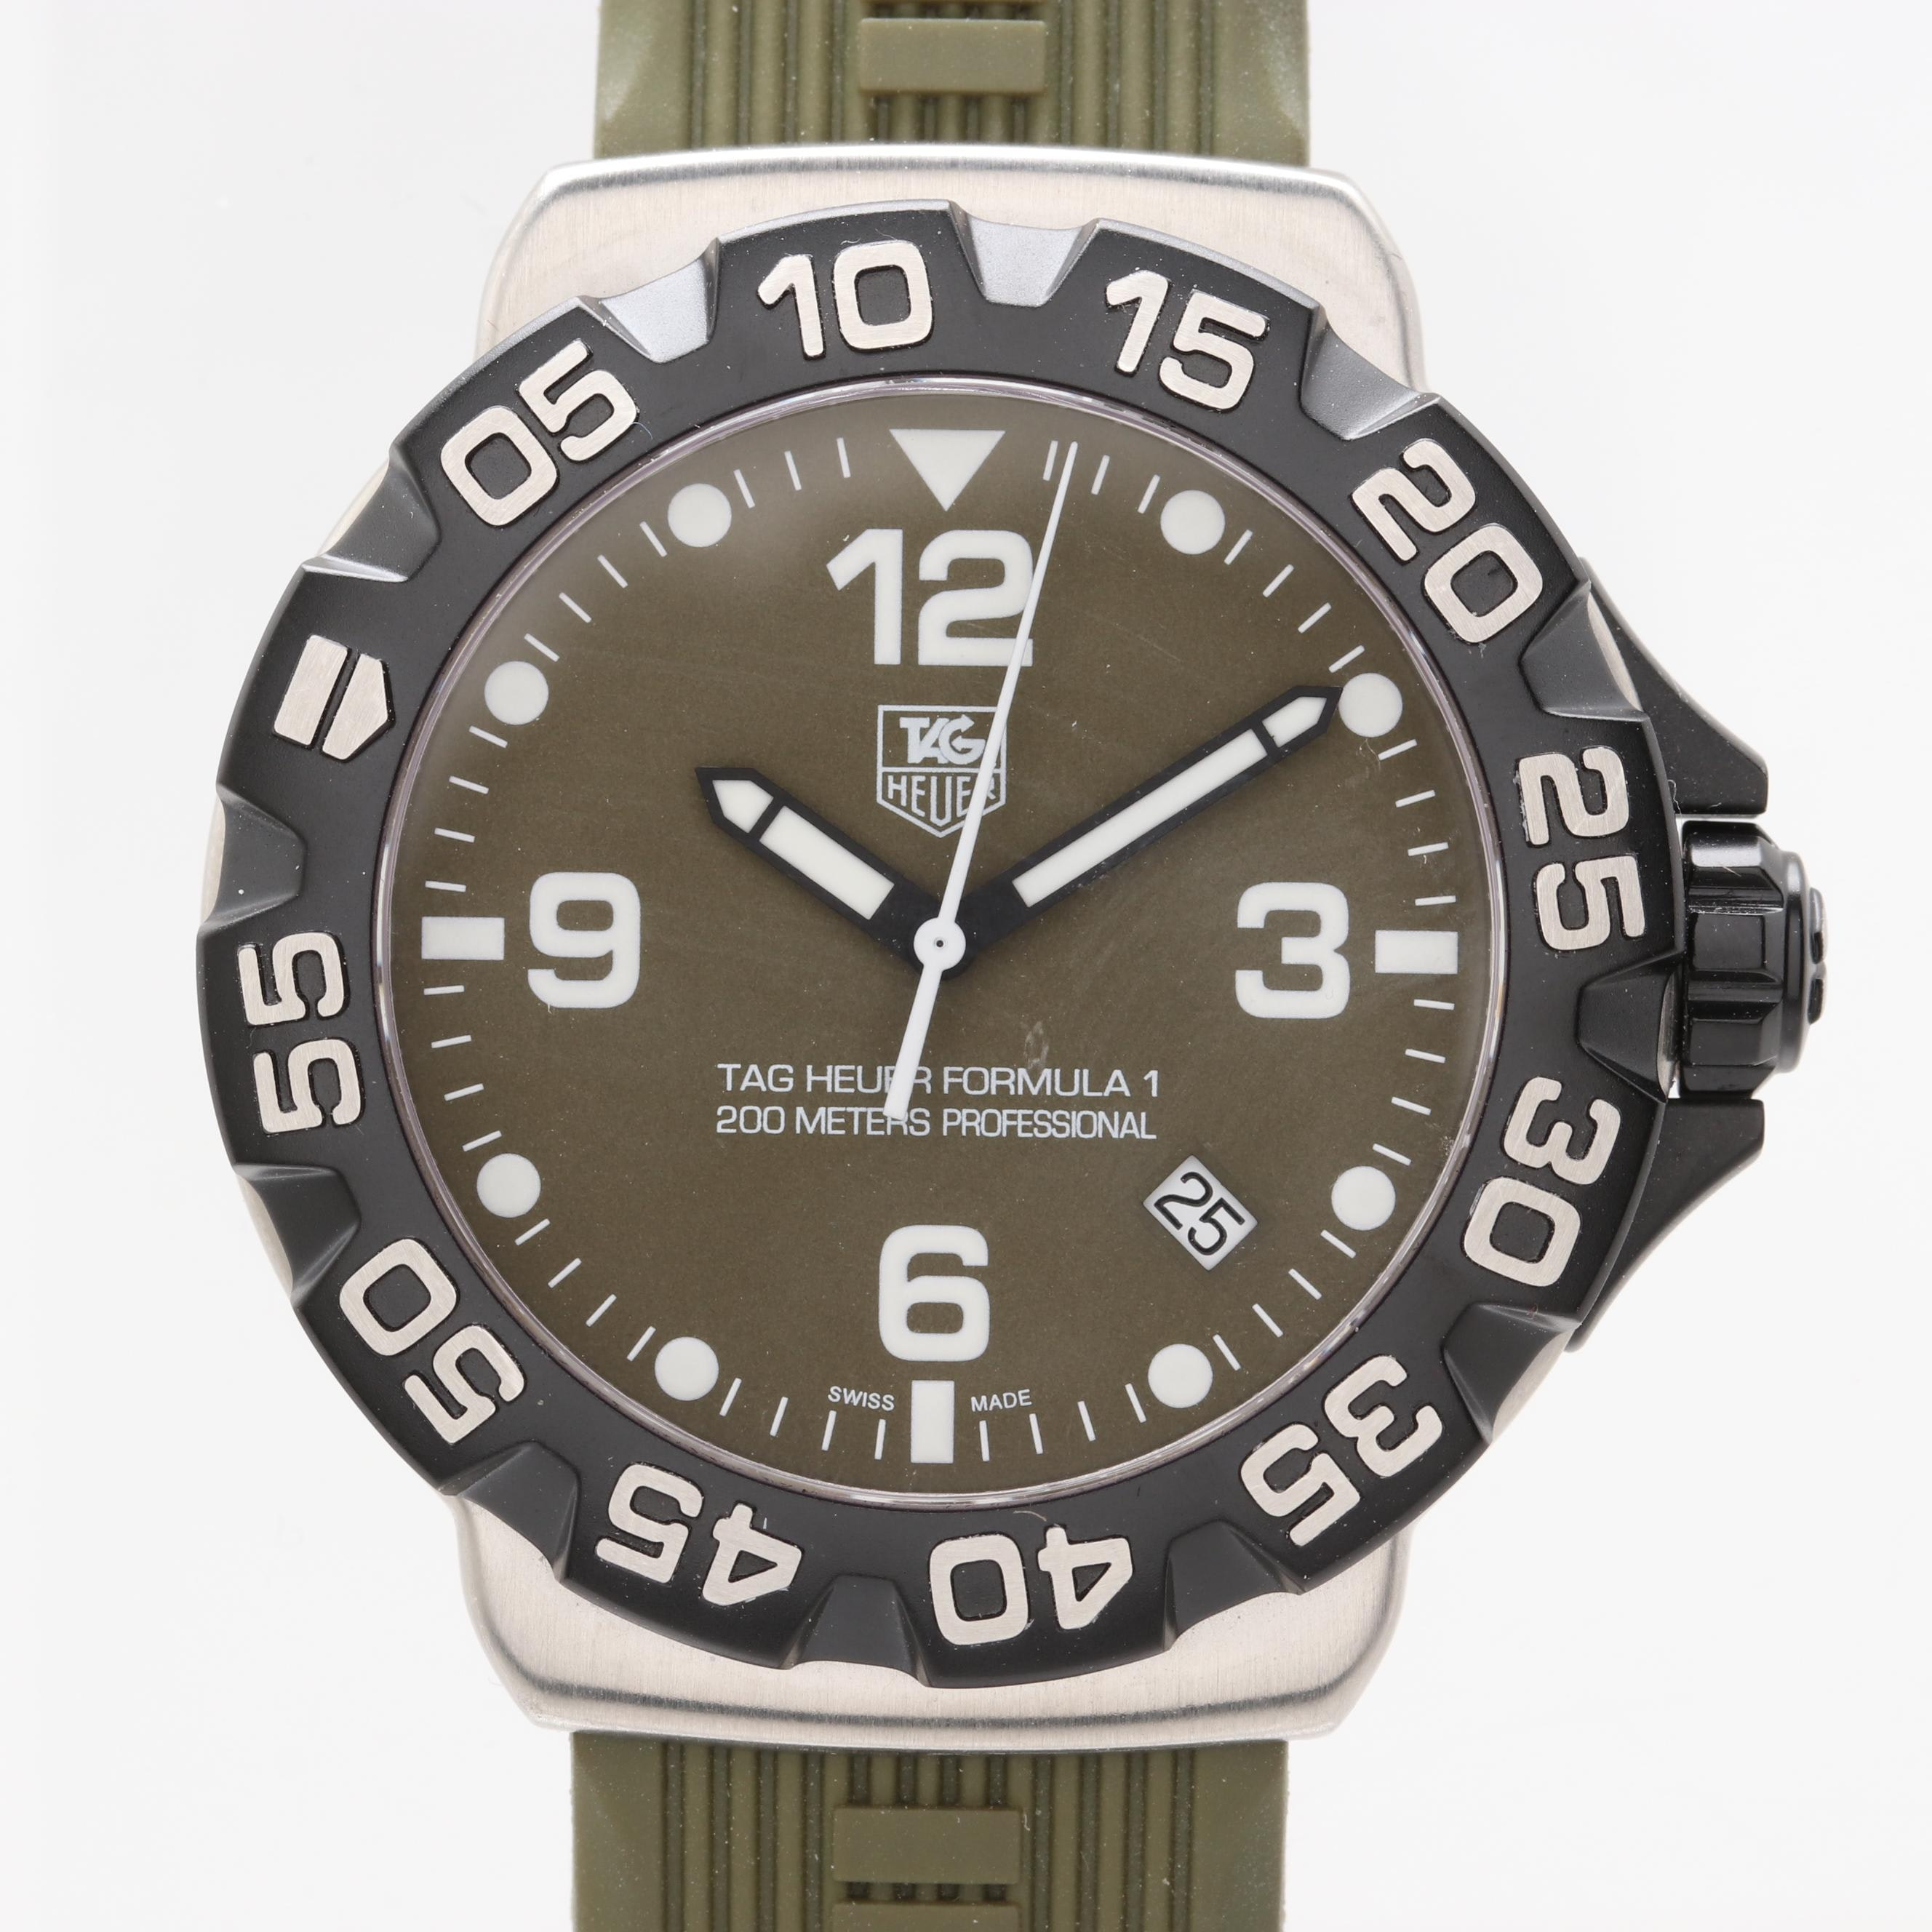 TAG Heuer Formula 1 200 Meters Stainless Steel Wristwatch